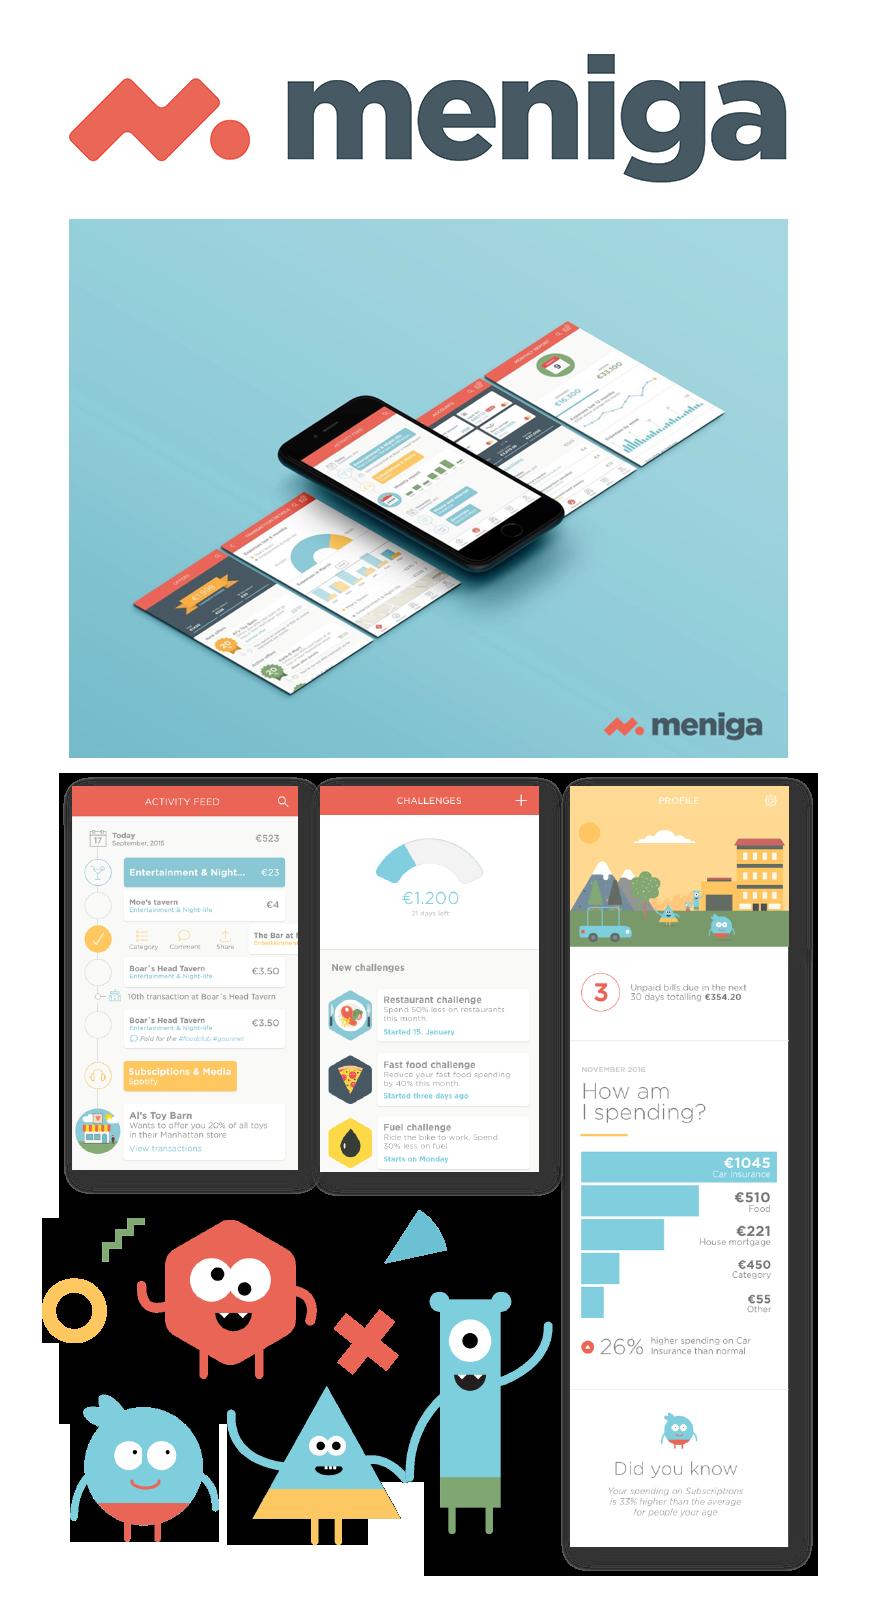 Meniga_Visual.png